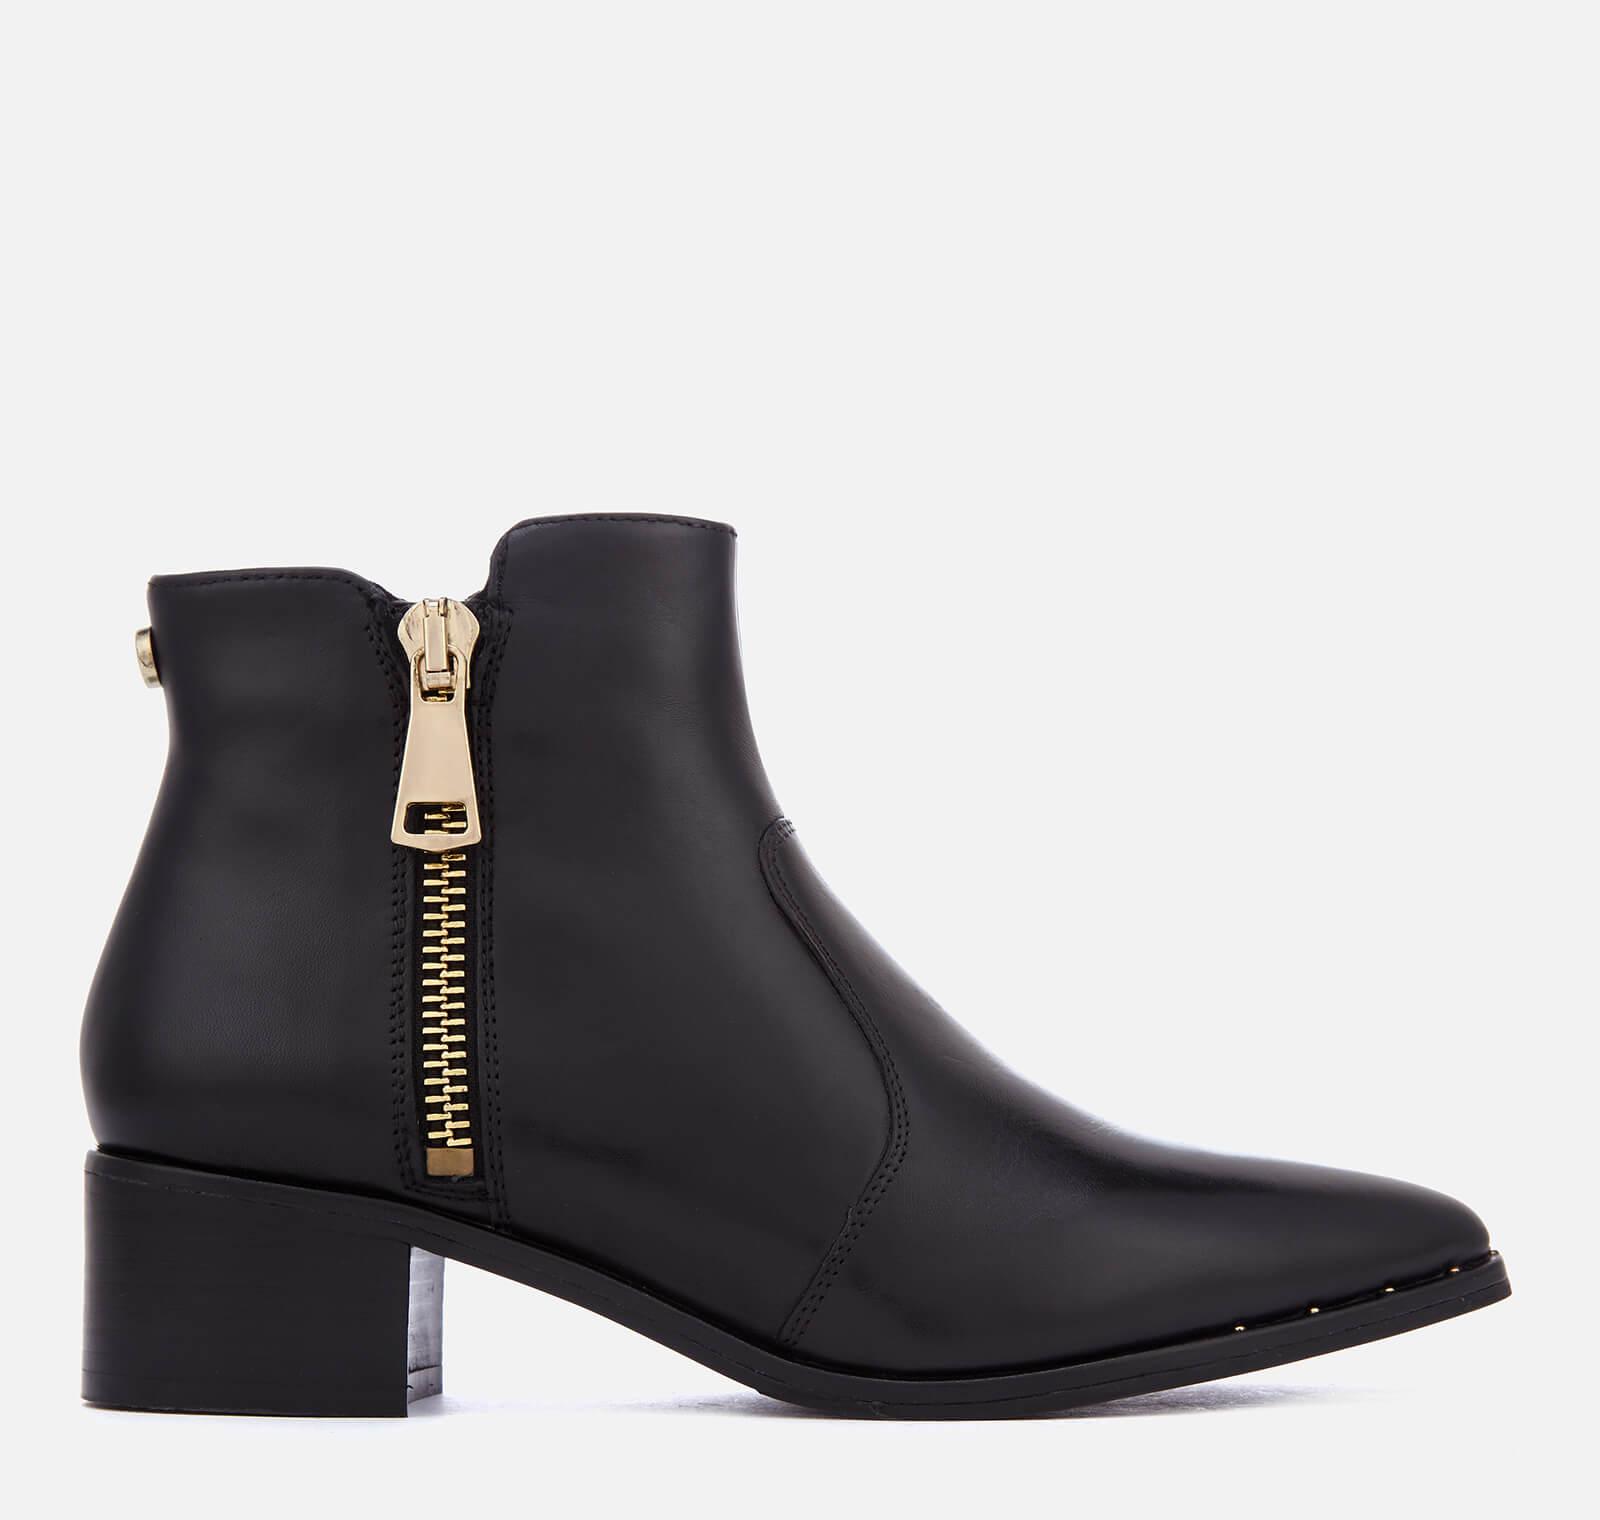 08056e4cf9 Steve Madden Women's Dylles Leather Heeled Ankle Boots - Black Womens  Footwear | TheHut.com